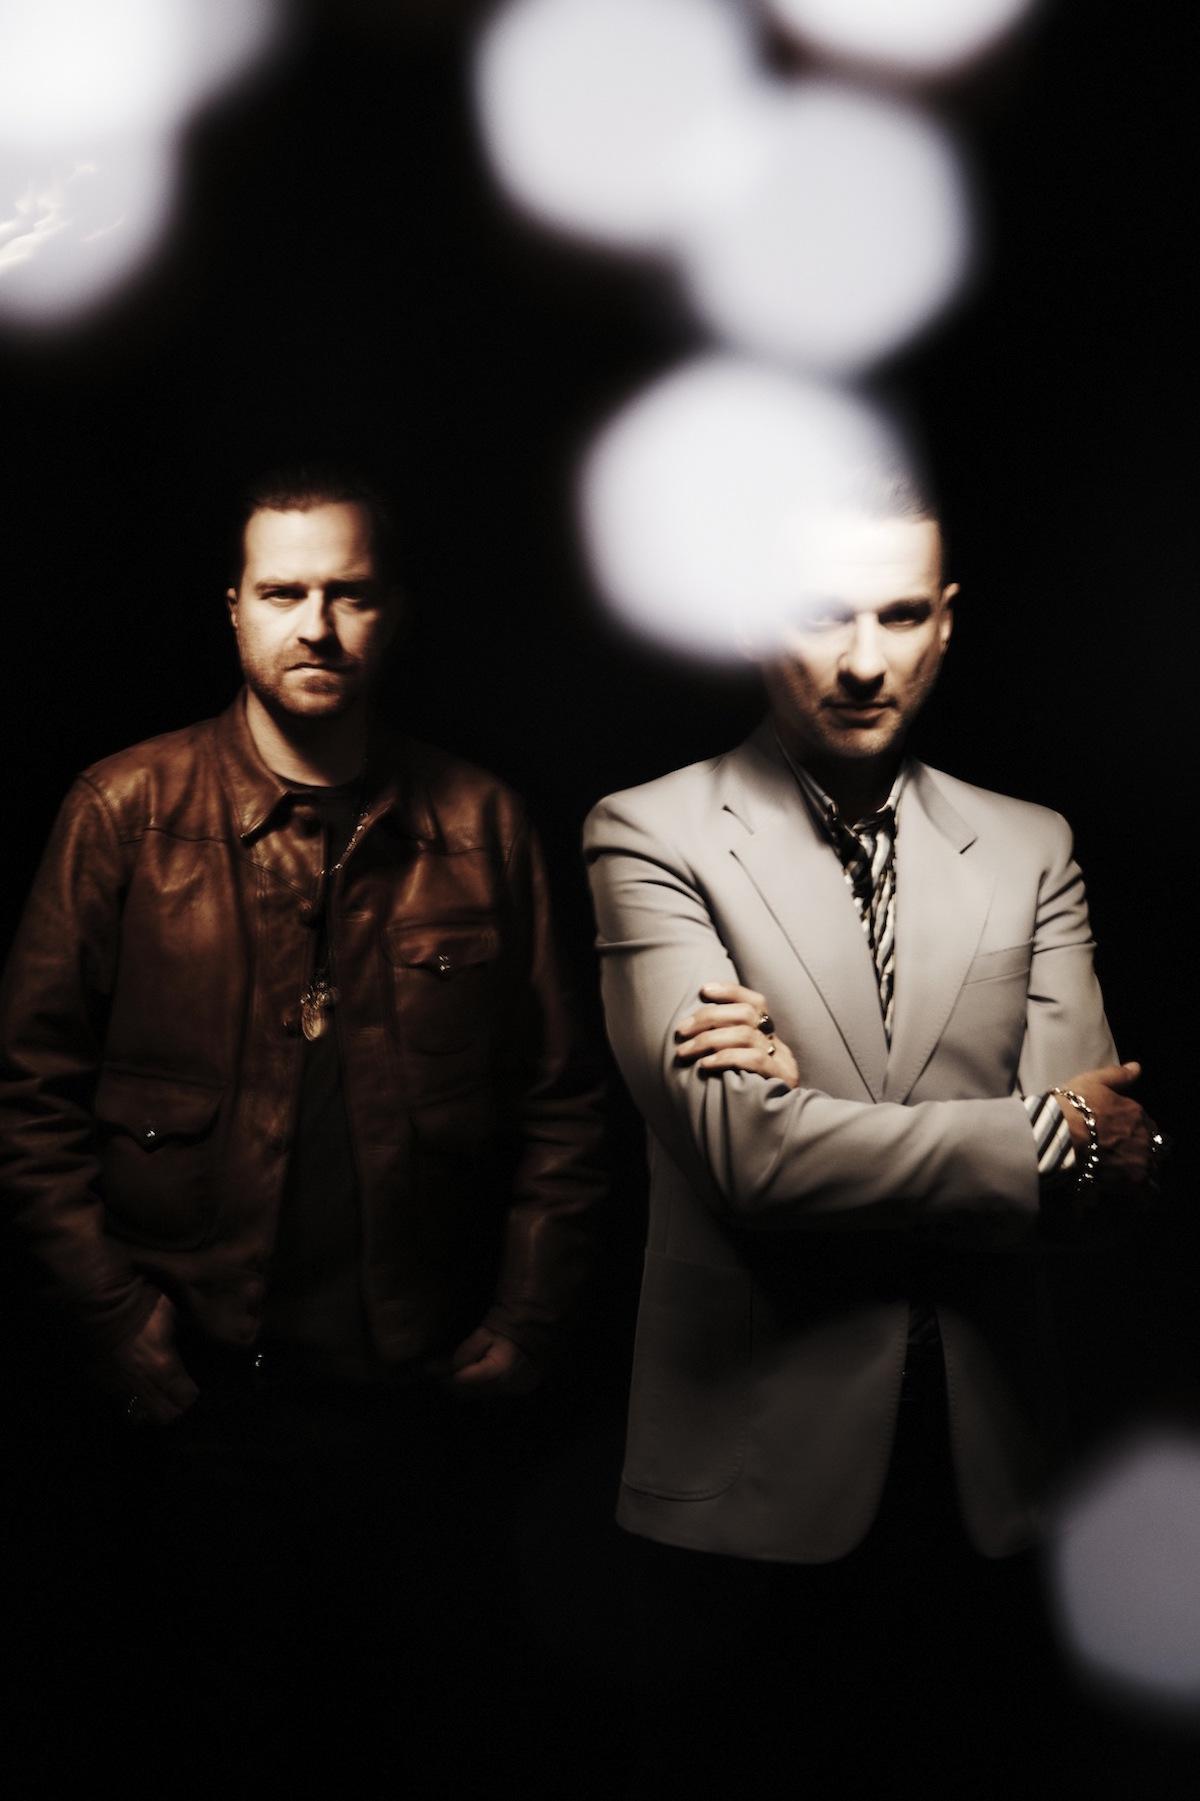 Dave Gahan & Soulsavers (Credit Sony Music)